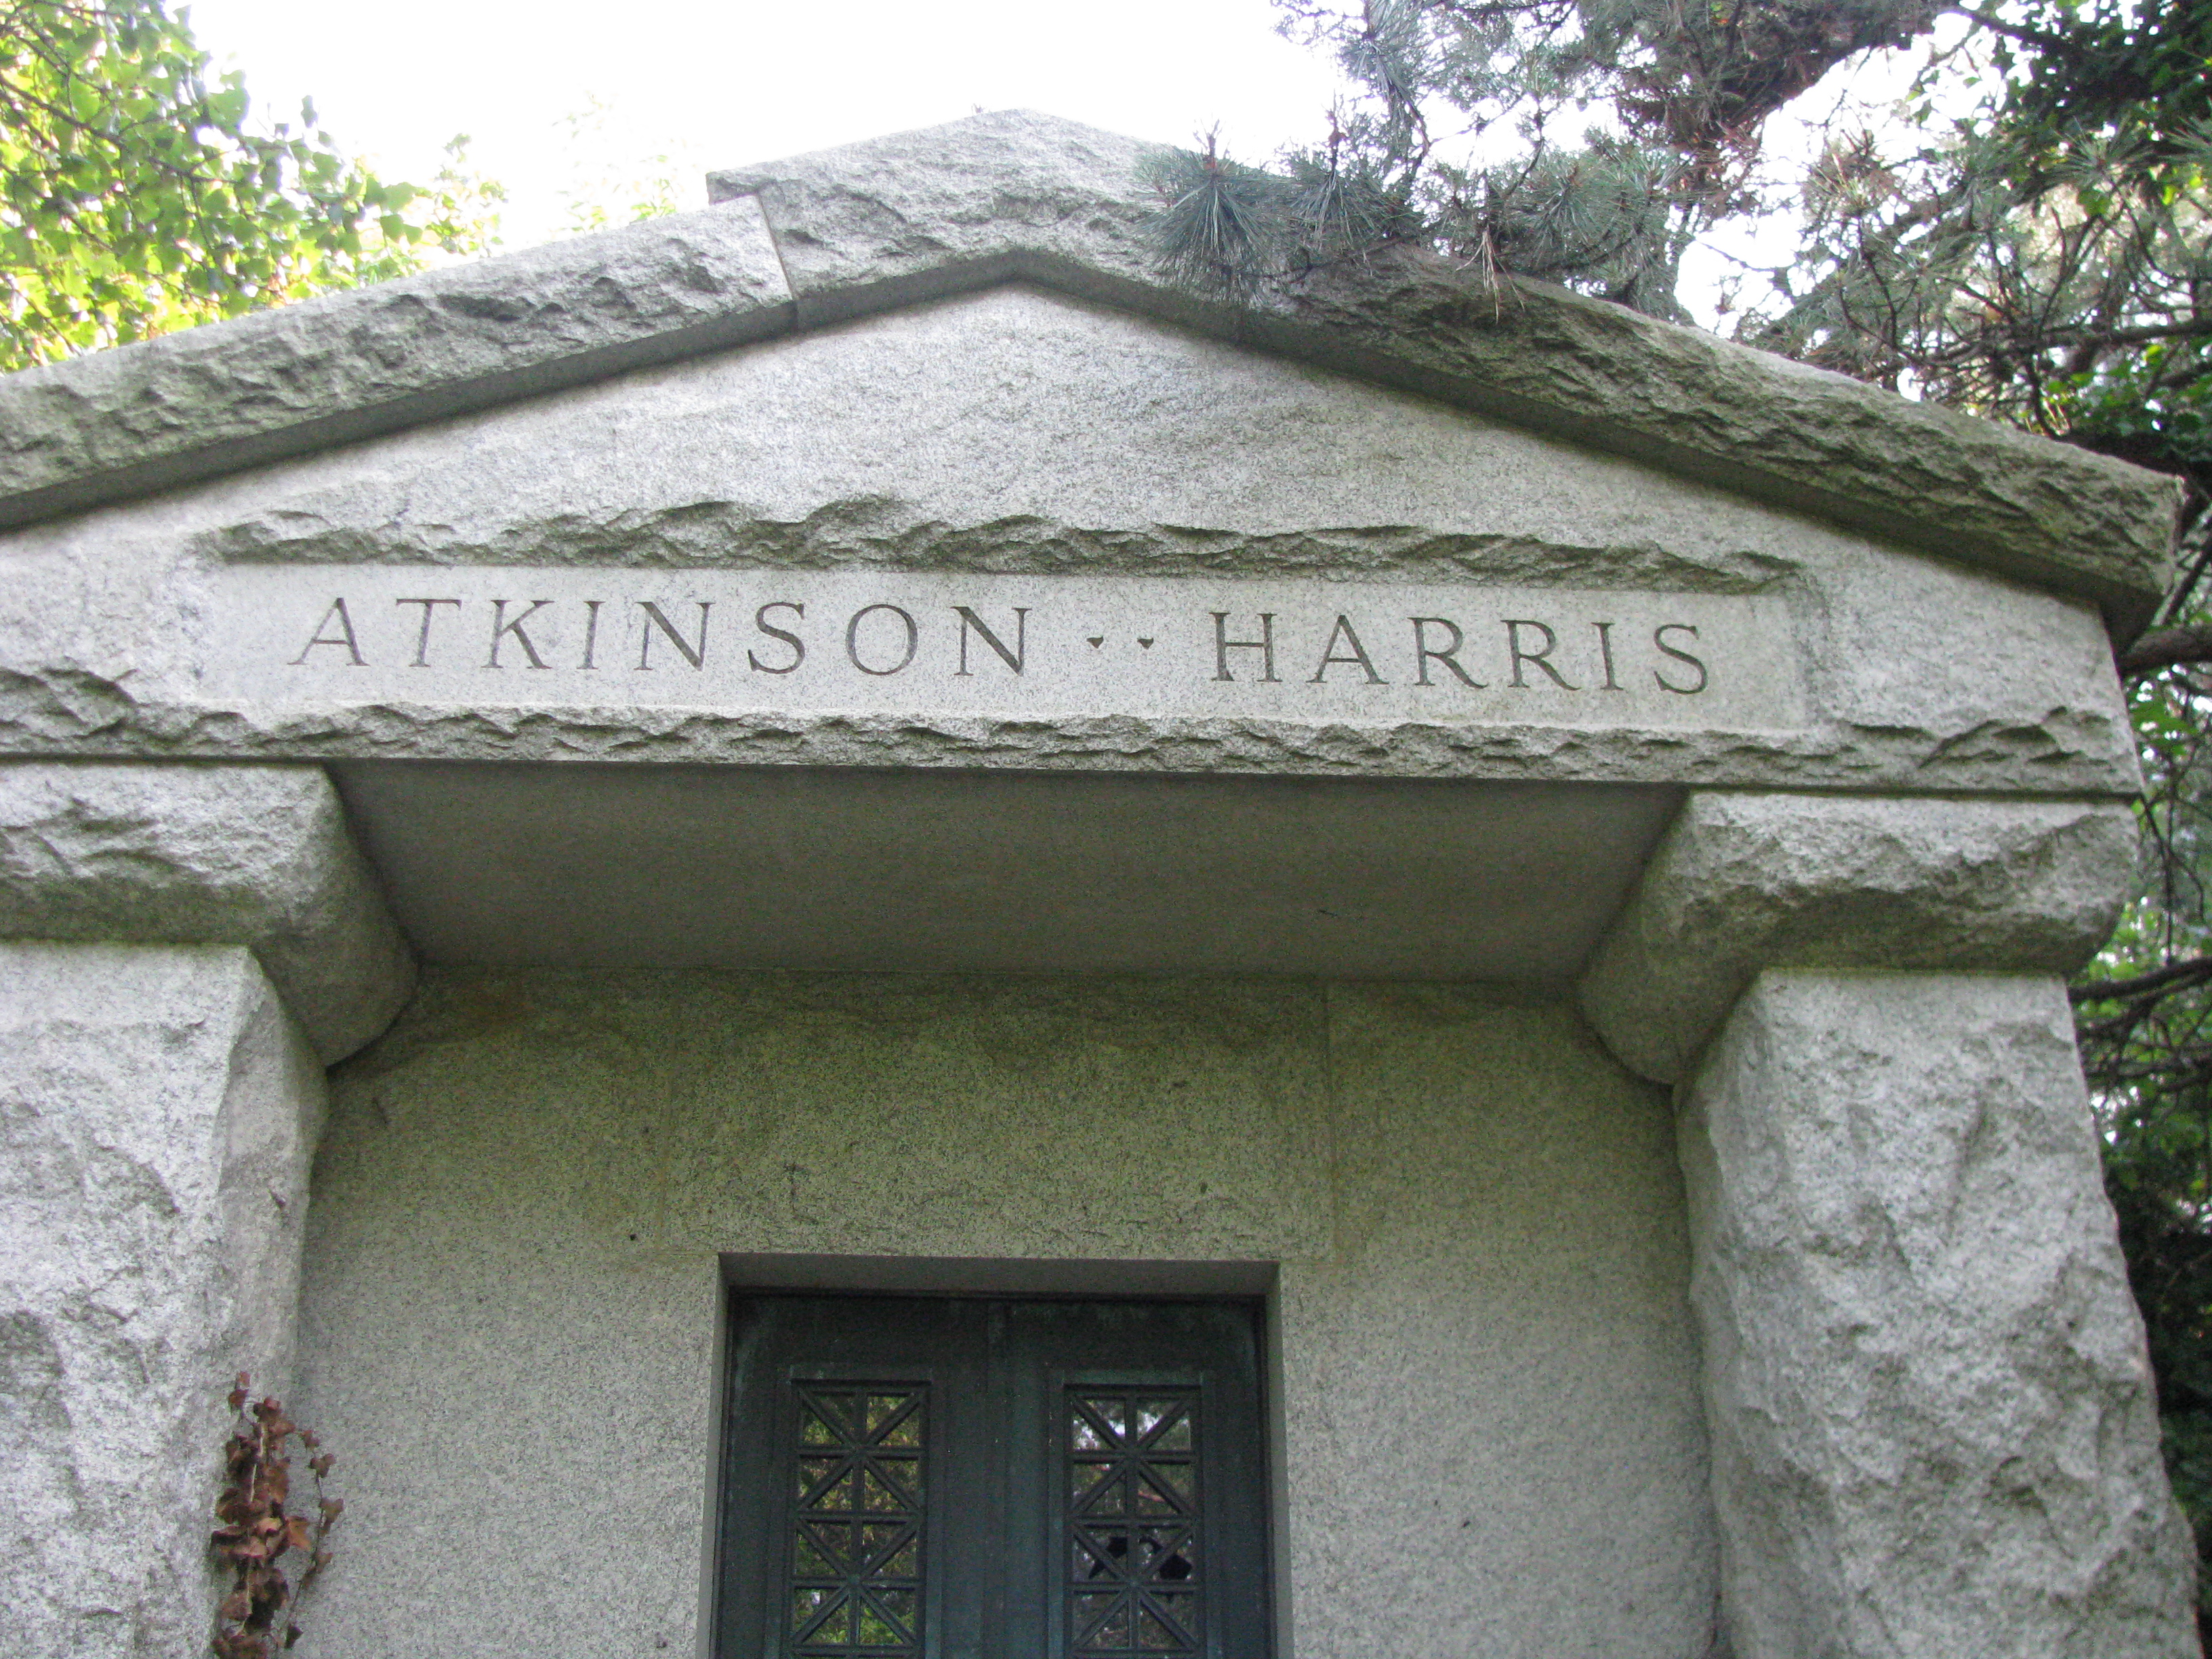 Mount Prospect Cemetery image 5